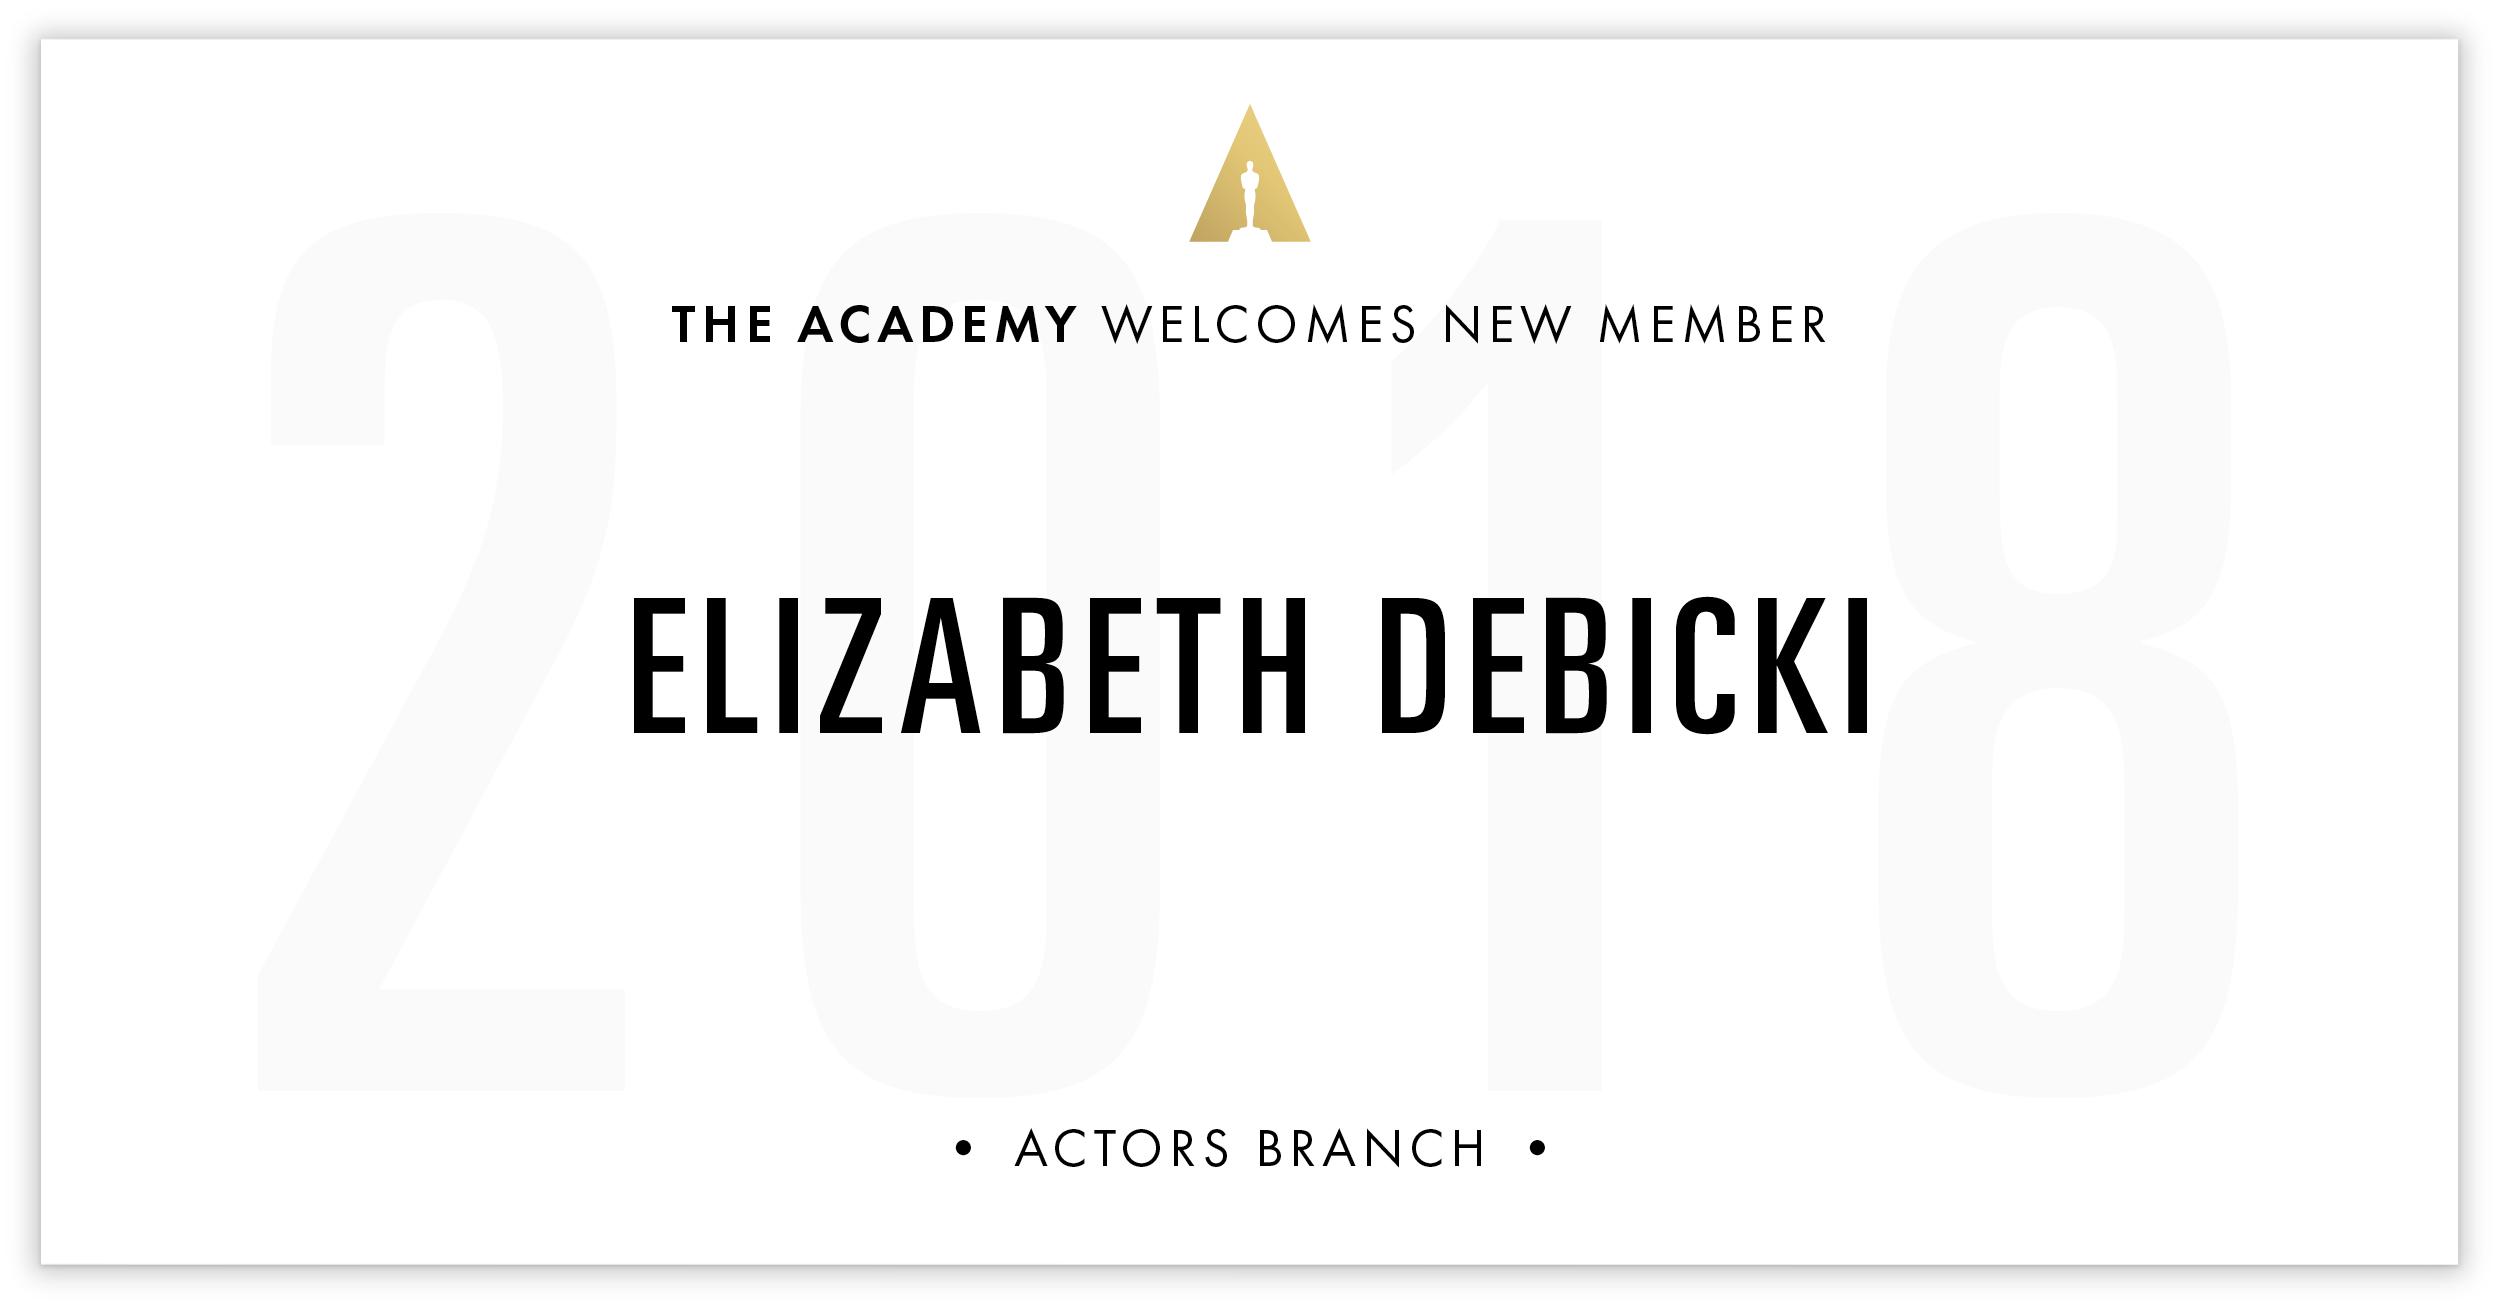 Elizabeth Debicki is invited!